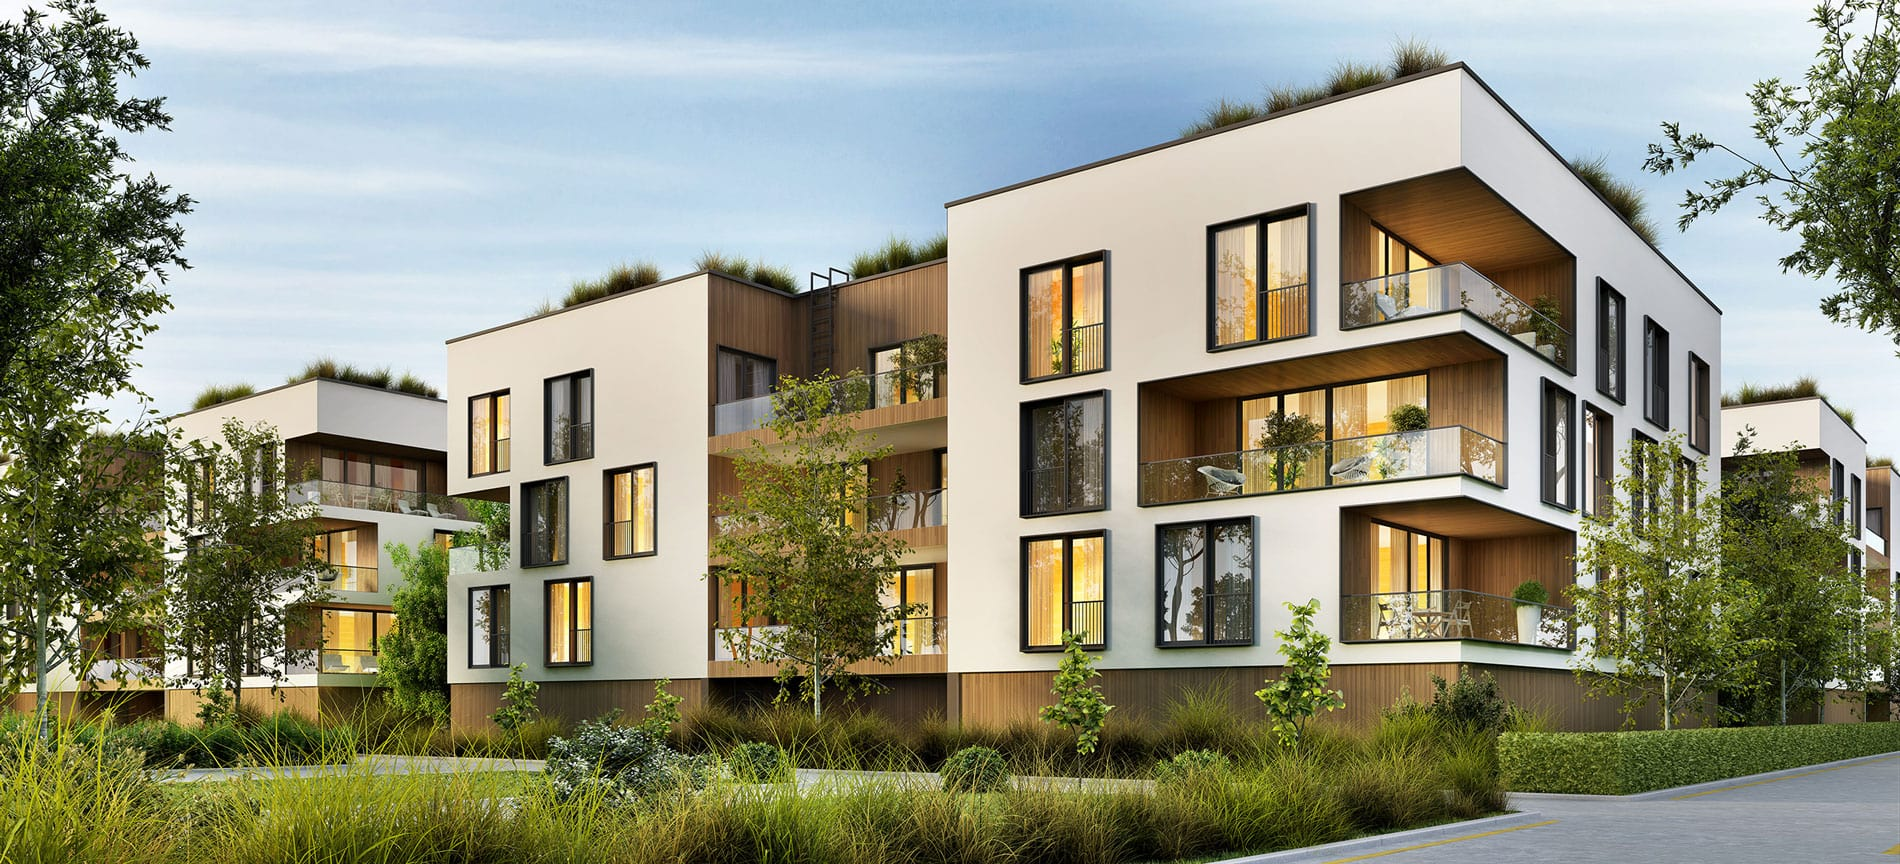 Wohnanalge Projekt in Neu Wulmstorf